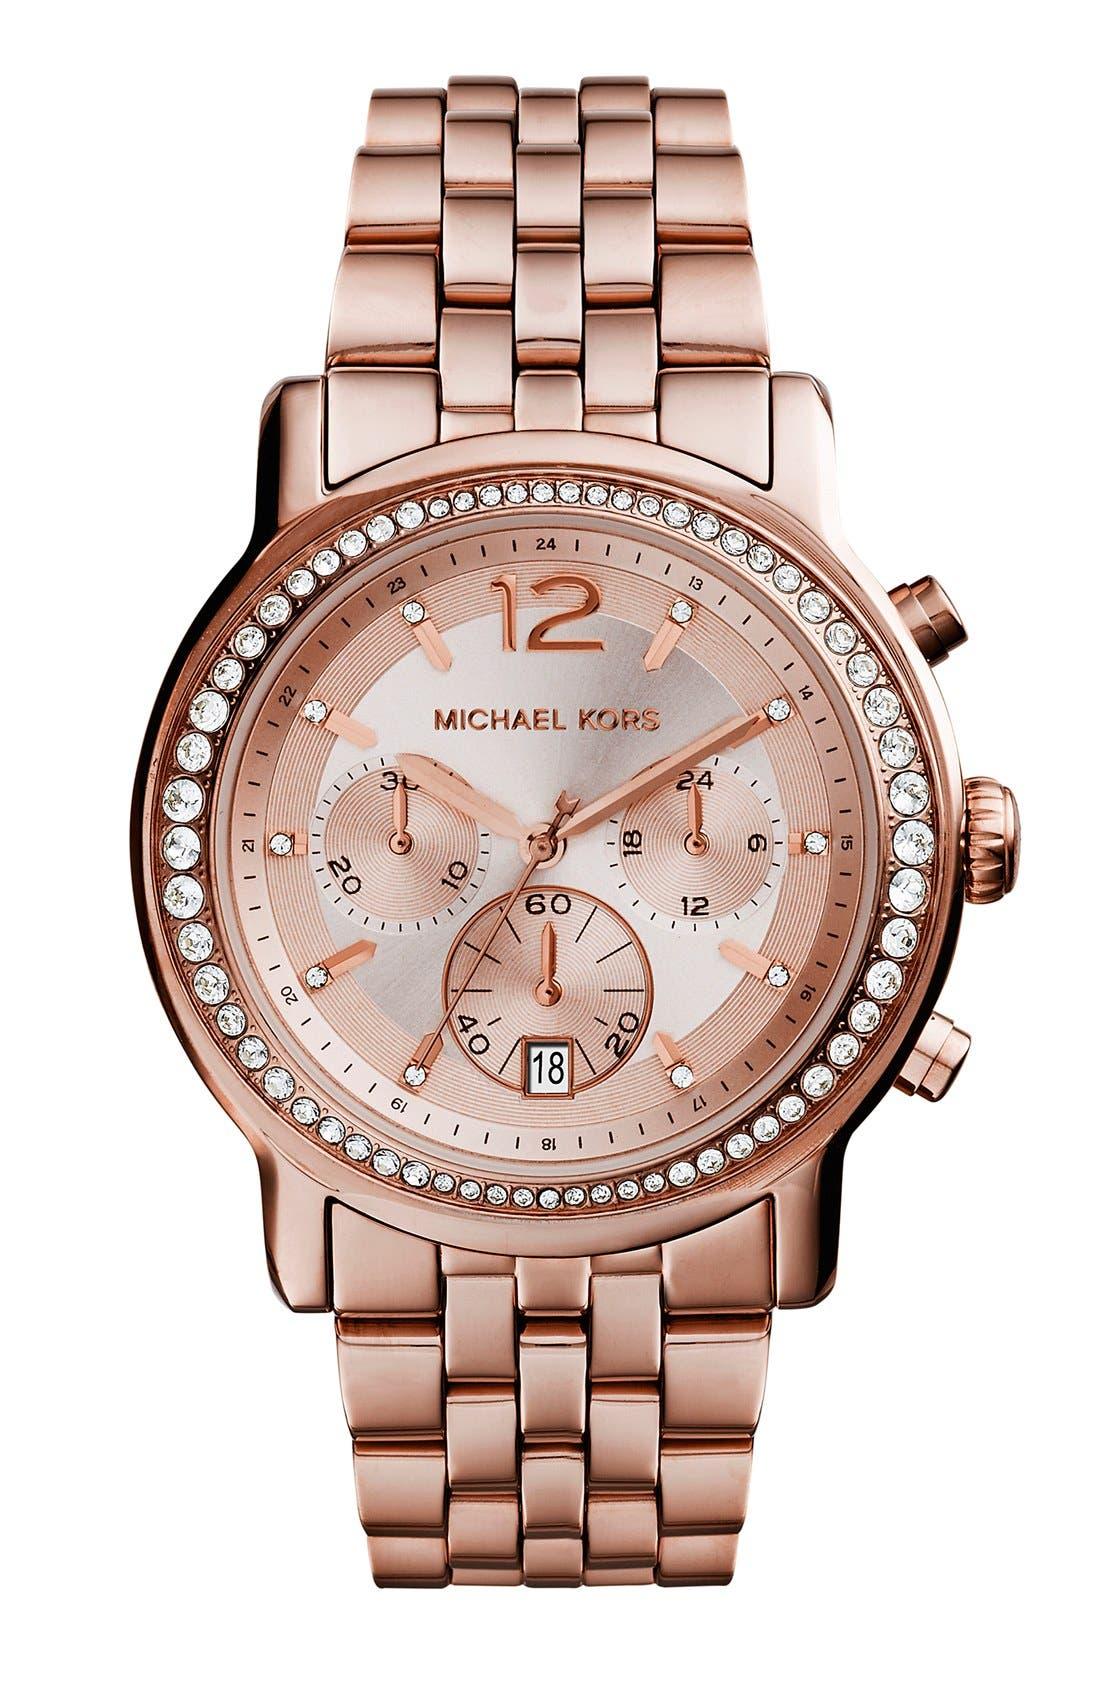 Main Image - Michael Kors 'Baisley' Crystal Bezel Chronograph Bracelet Watch, 41mm (Nordstrom Exclusive)